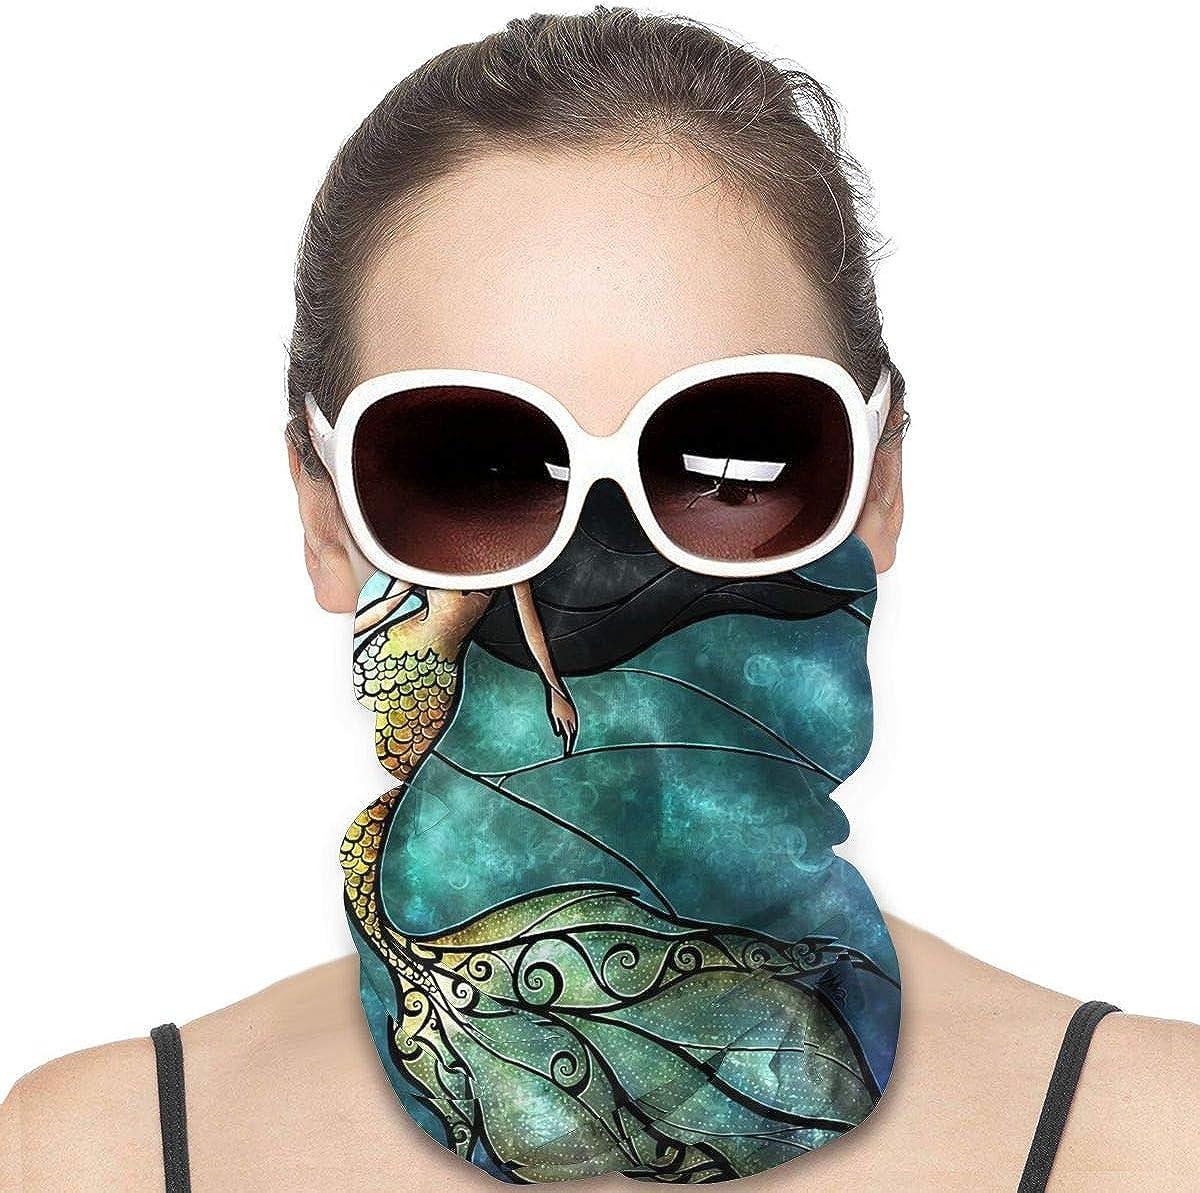 Tidyki Neck Gaiters for Men - Mermaid Stained Glass Jadeite Motorcycle Mask Ski Mask Neck Gaiter Head Bands Neck Gaiters for Men Headwear Neck Warmer for Men